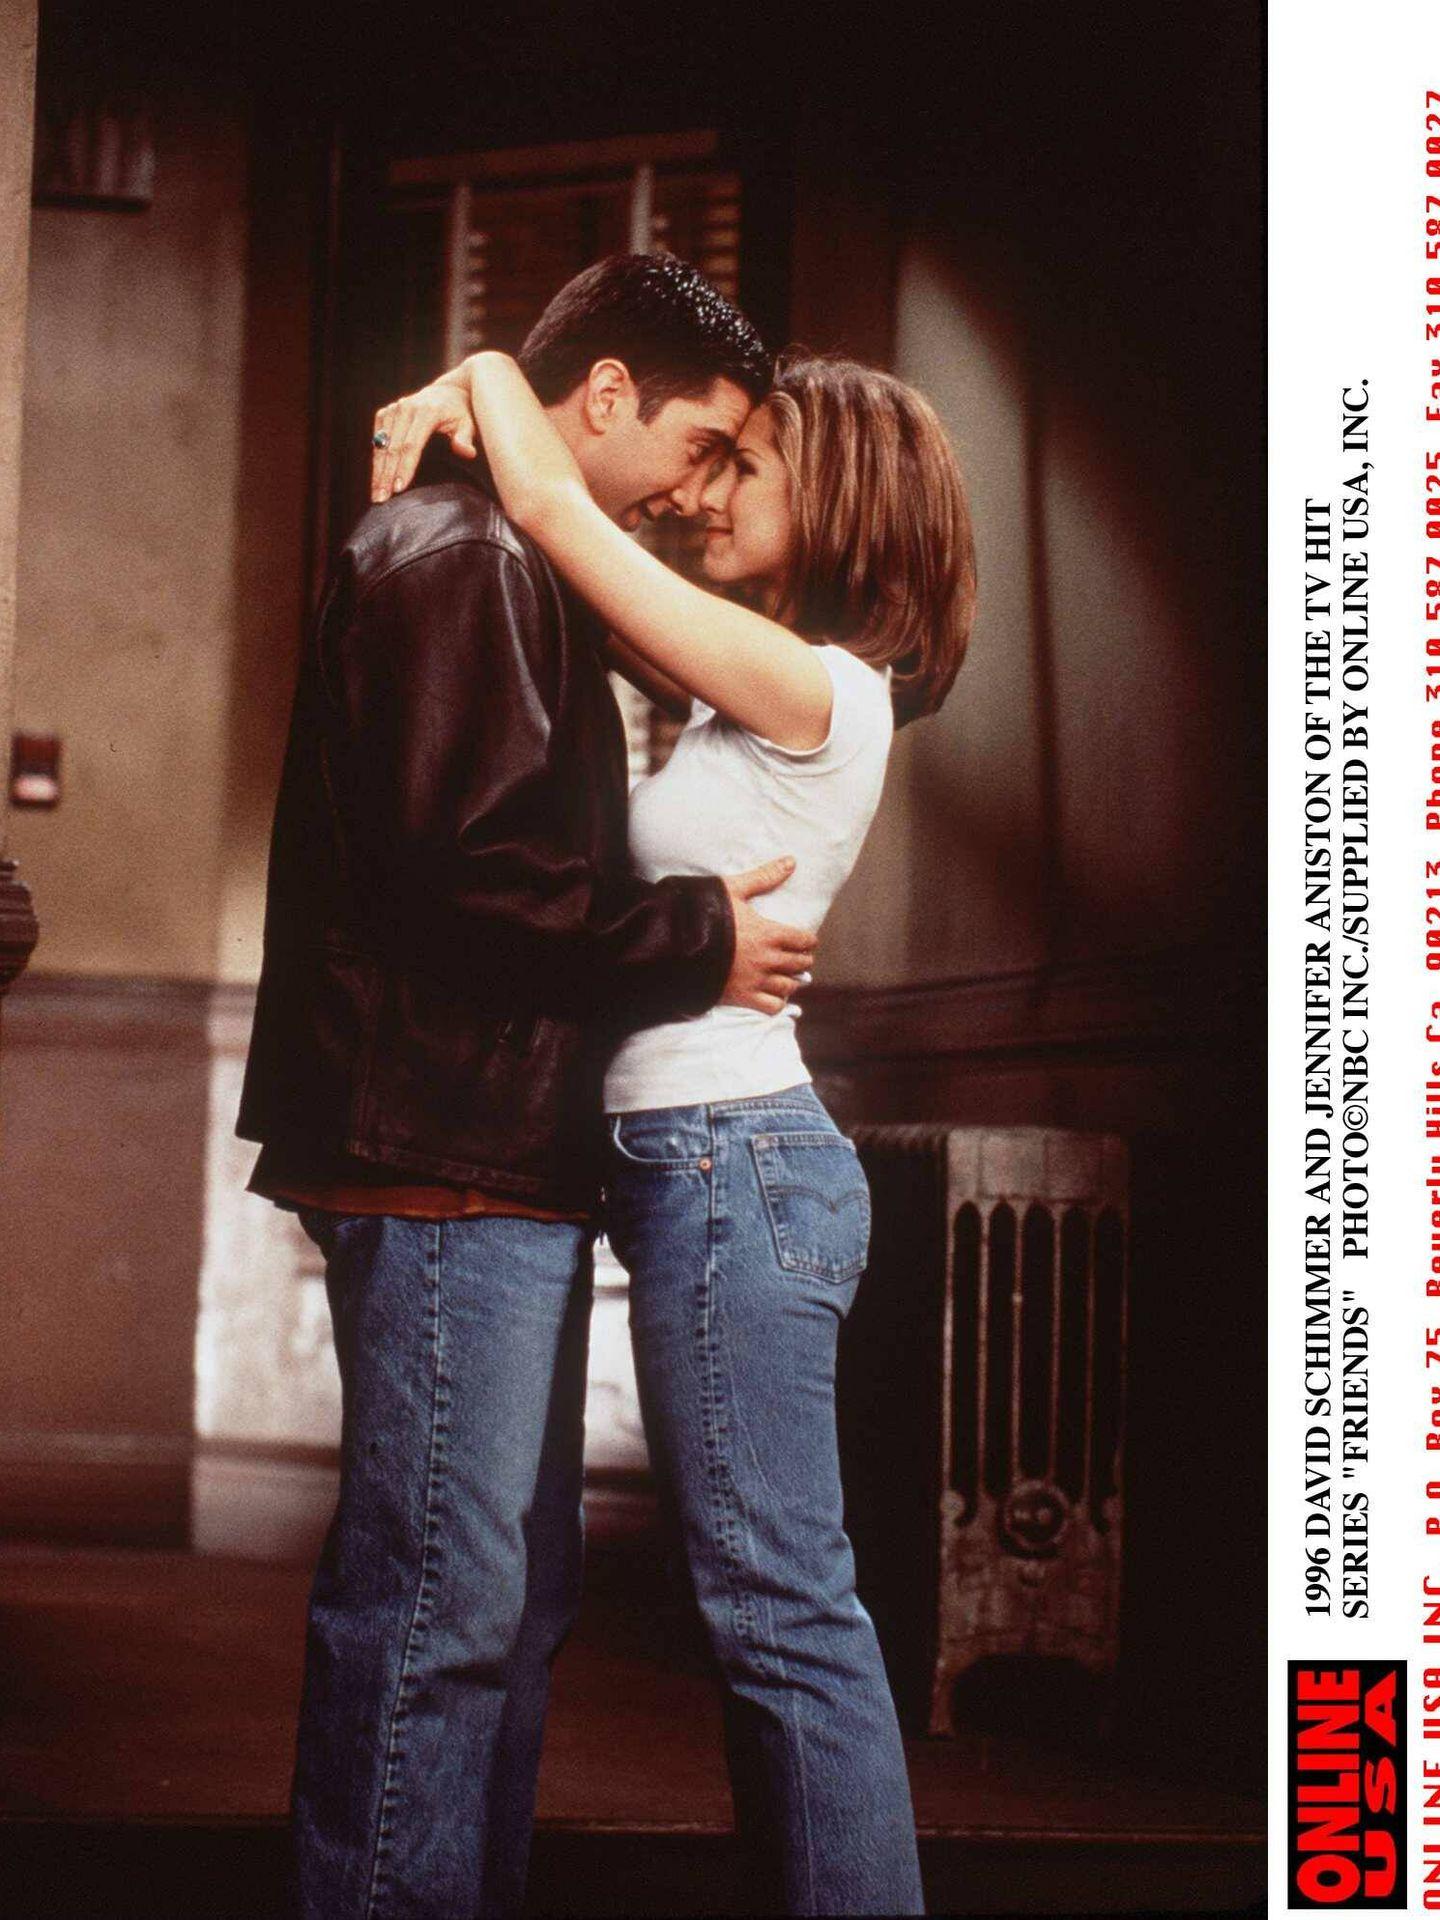 David Schwimmer y Jennifer Aniston, interpretando a Ross y Rachel en 'Friends'. (Getty)